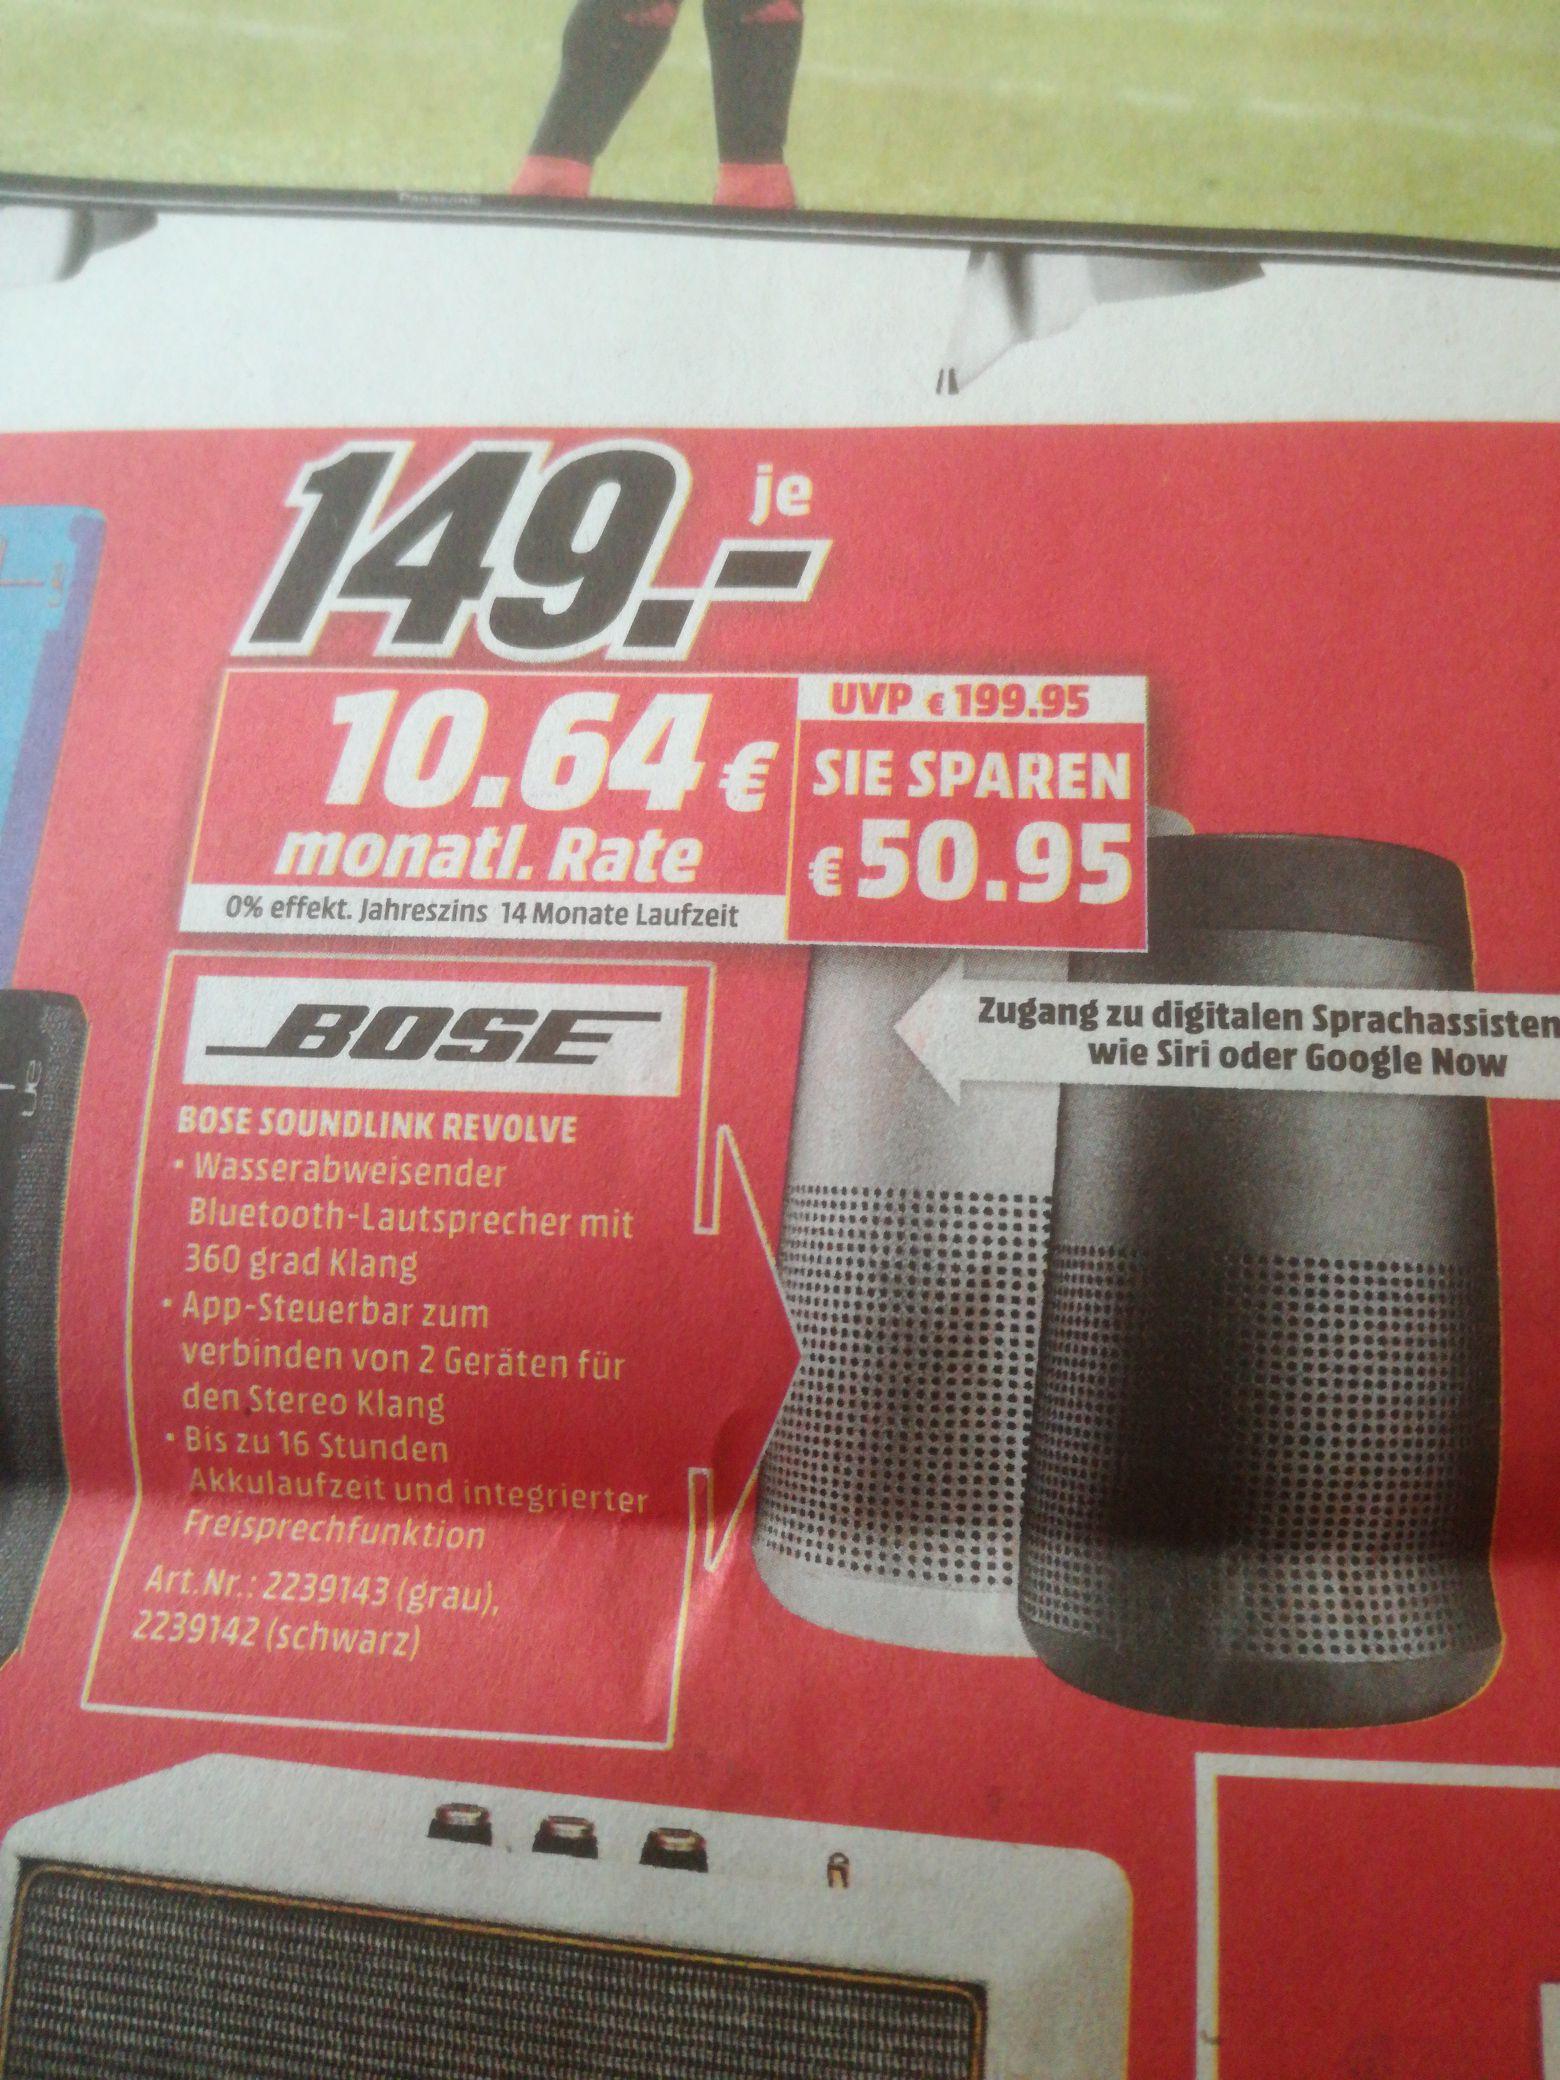 MEDIA MARKT DORTMUND OESPEL Bose Soundlink Revolve